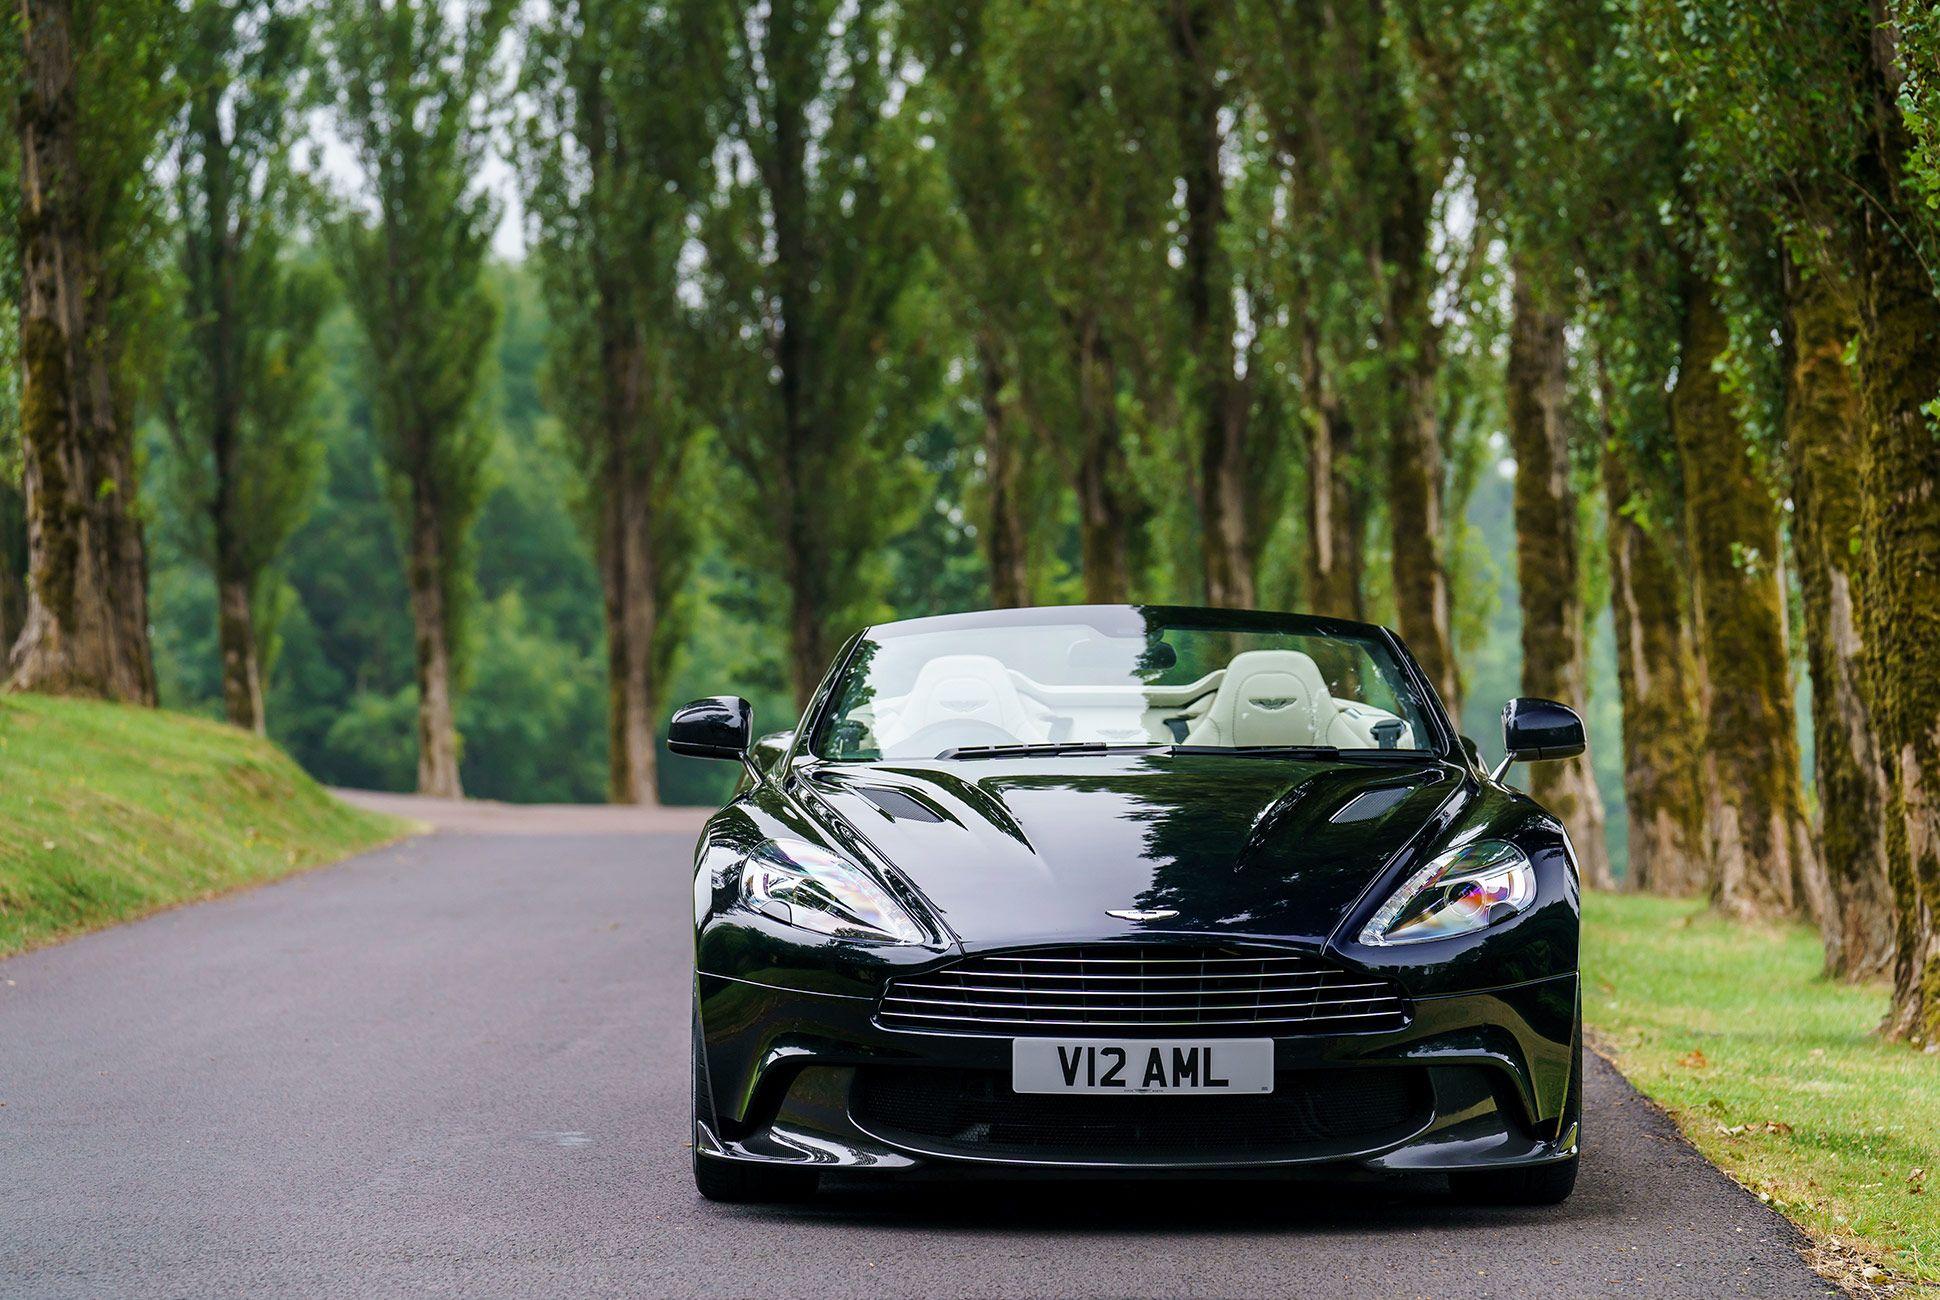 ****NEW*** Aston Martin Heritage Soft Feel Notebook